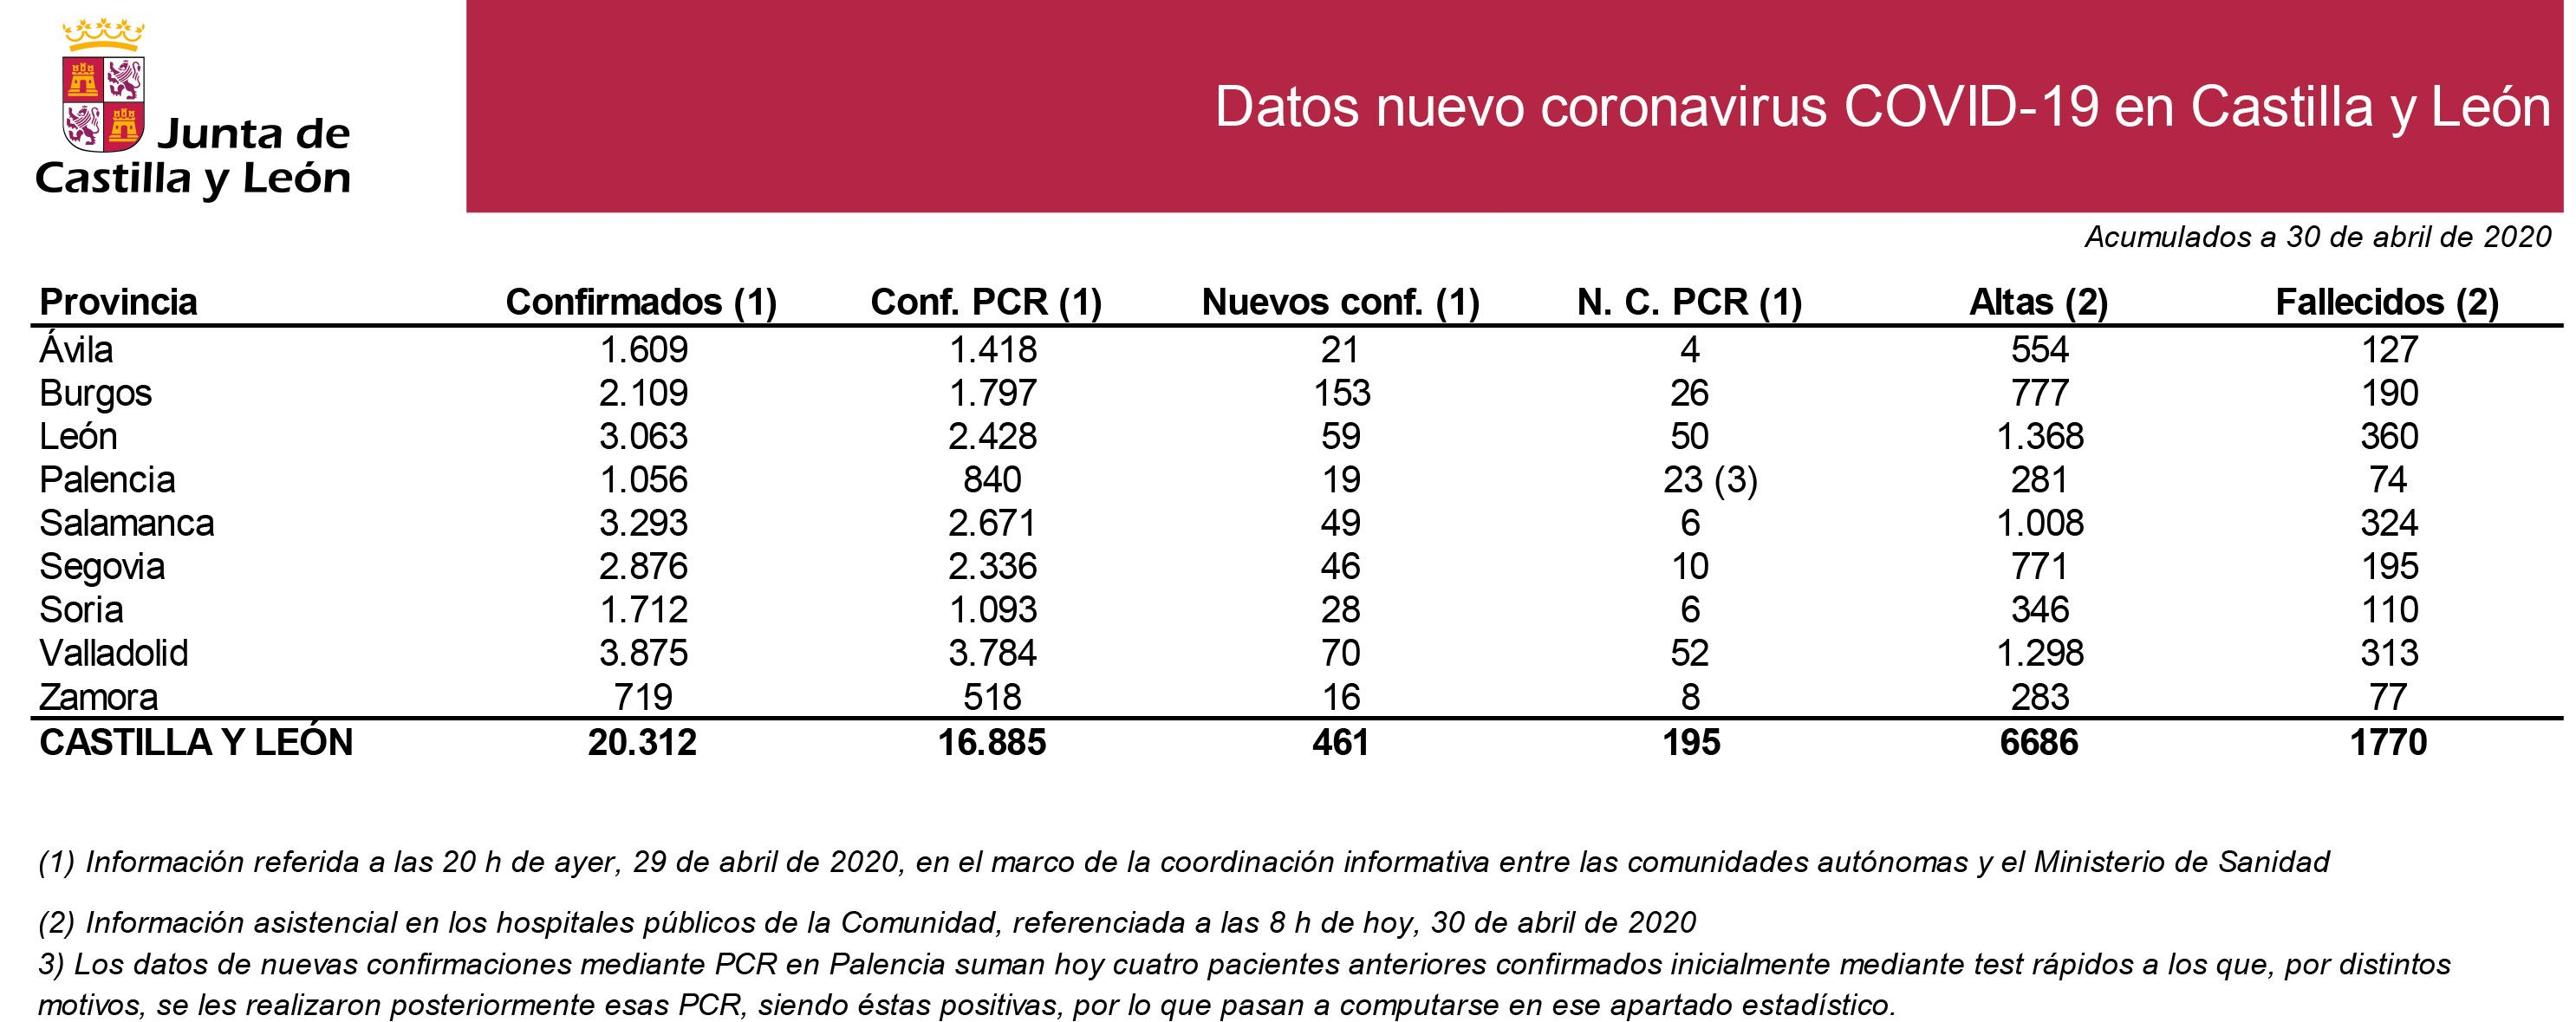 2020 04 30 Estadiu0301stica COVID 19 situaciou0301n 30 de abril  tabla con PCR (1)